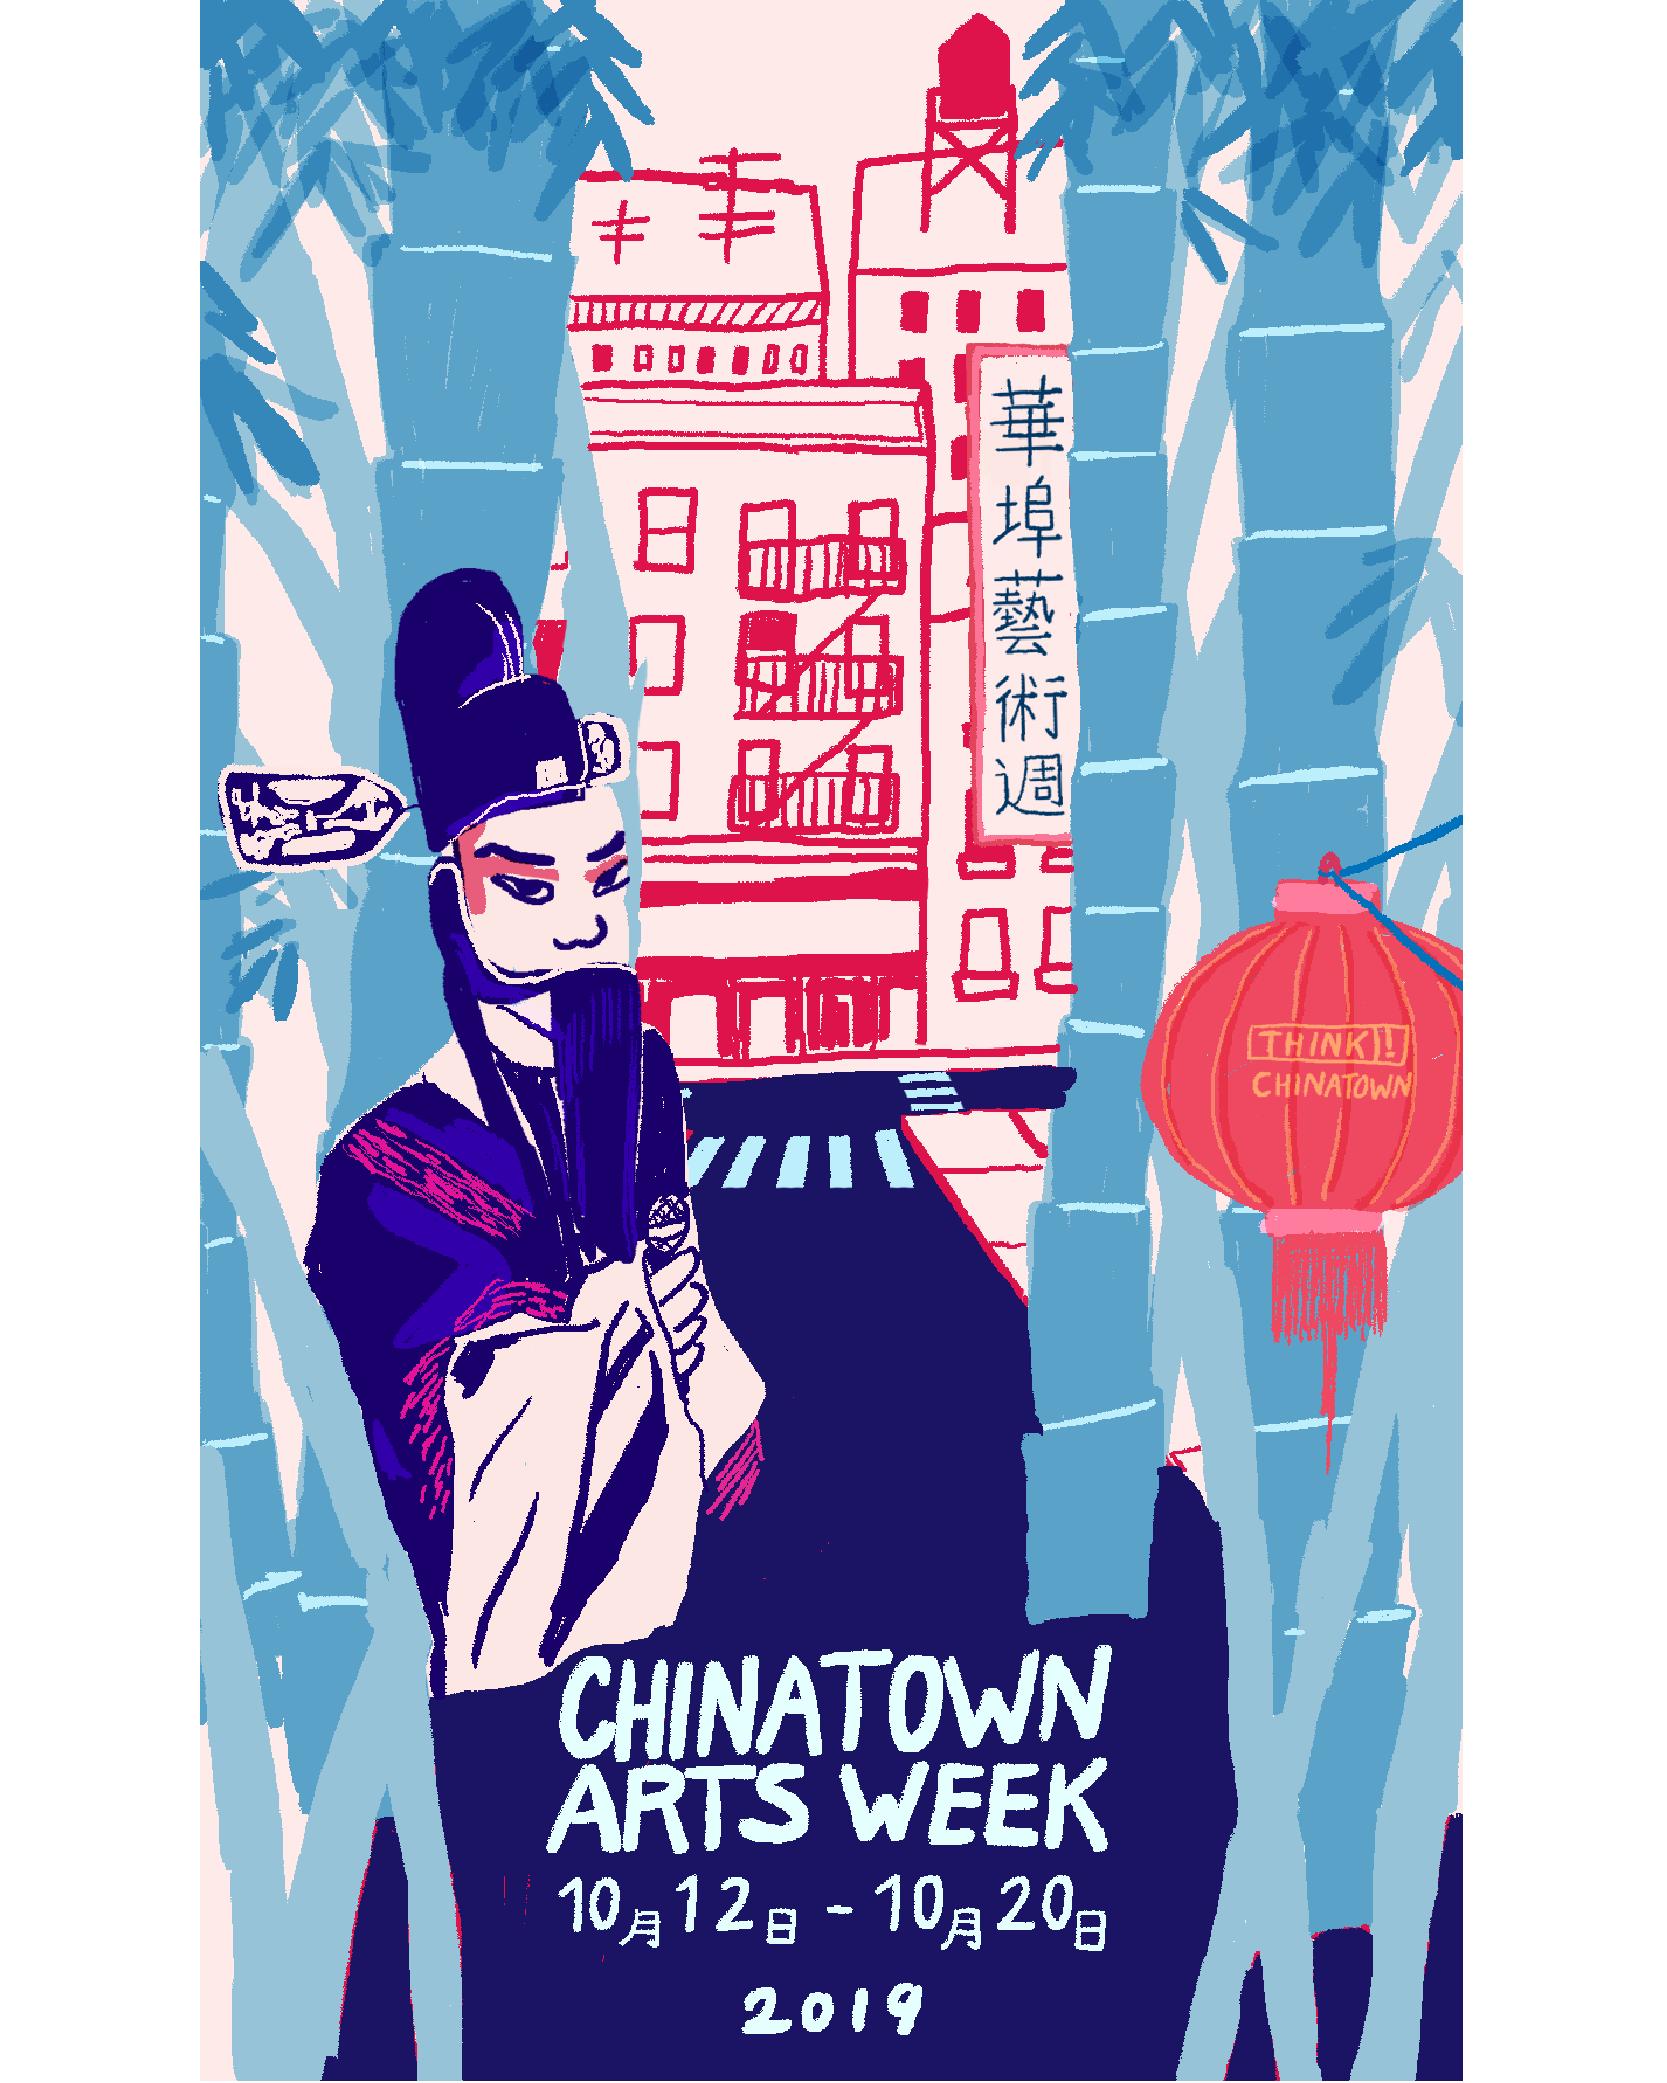 ChAW poster illustrator: James Chan